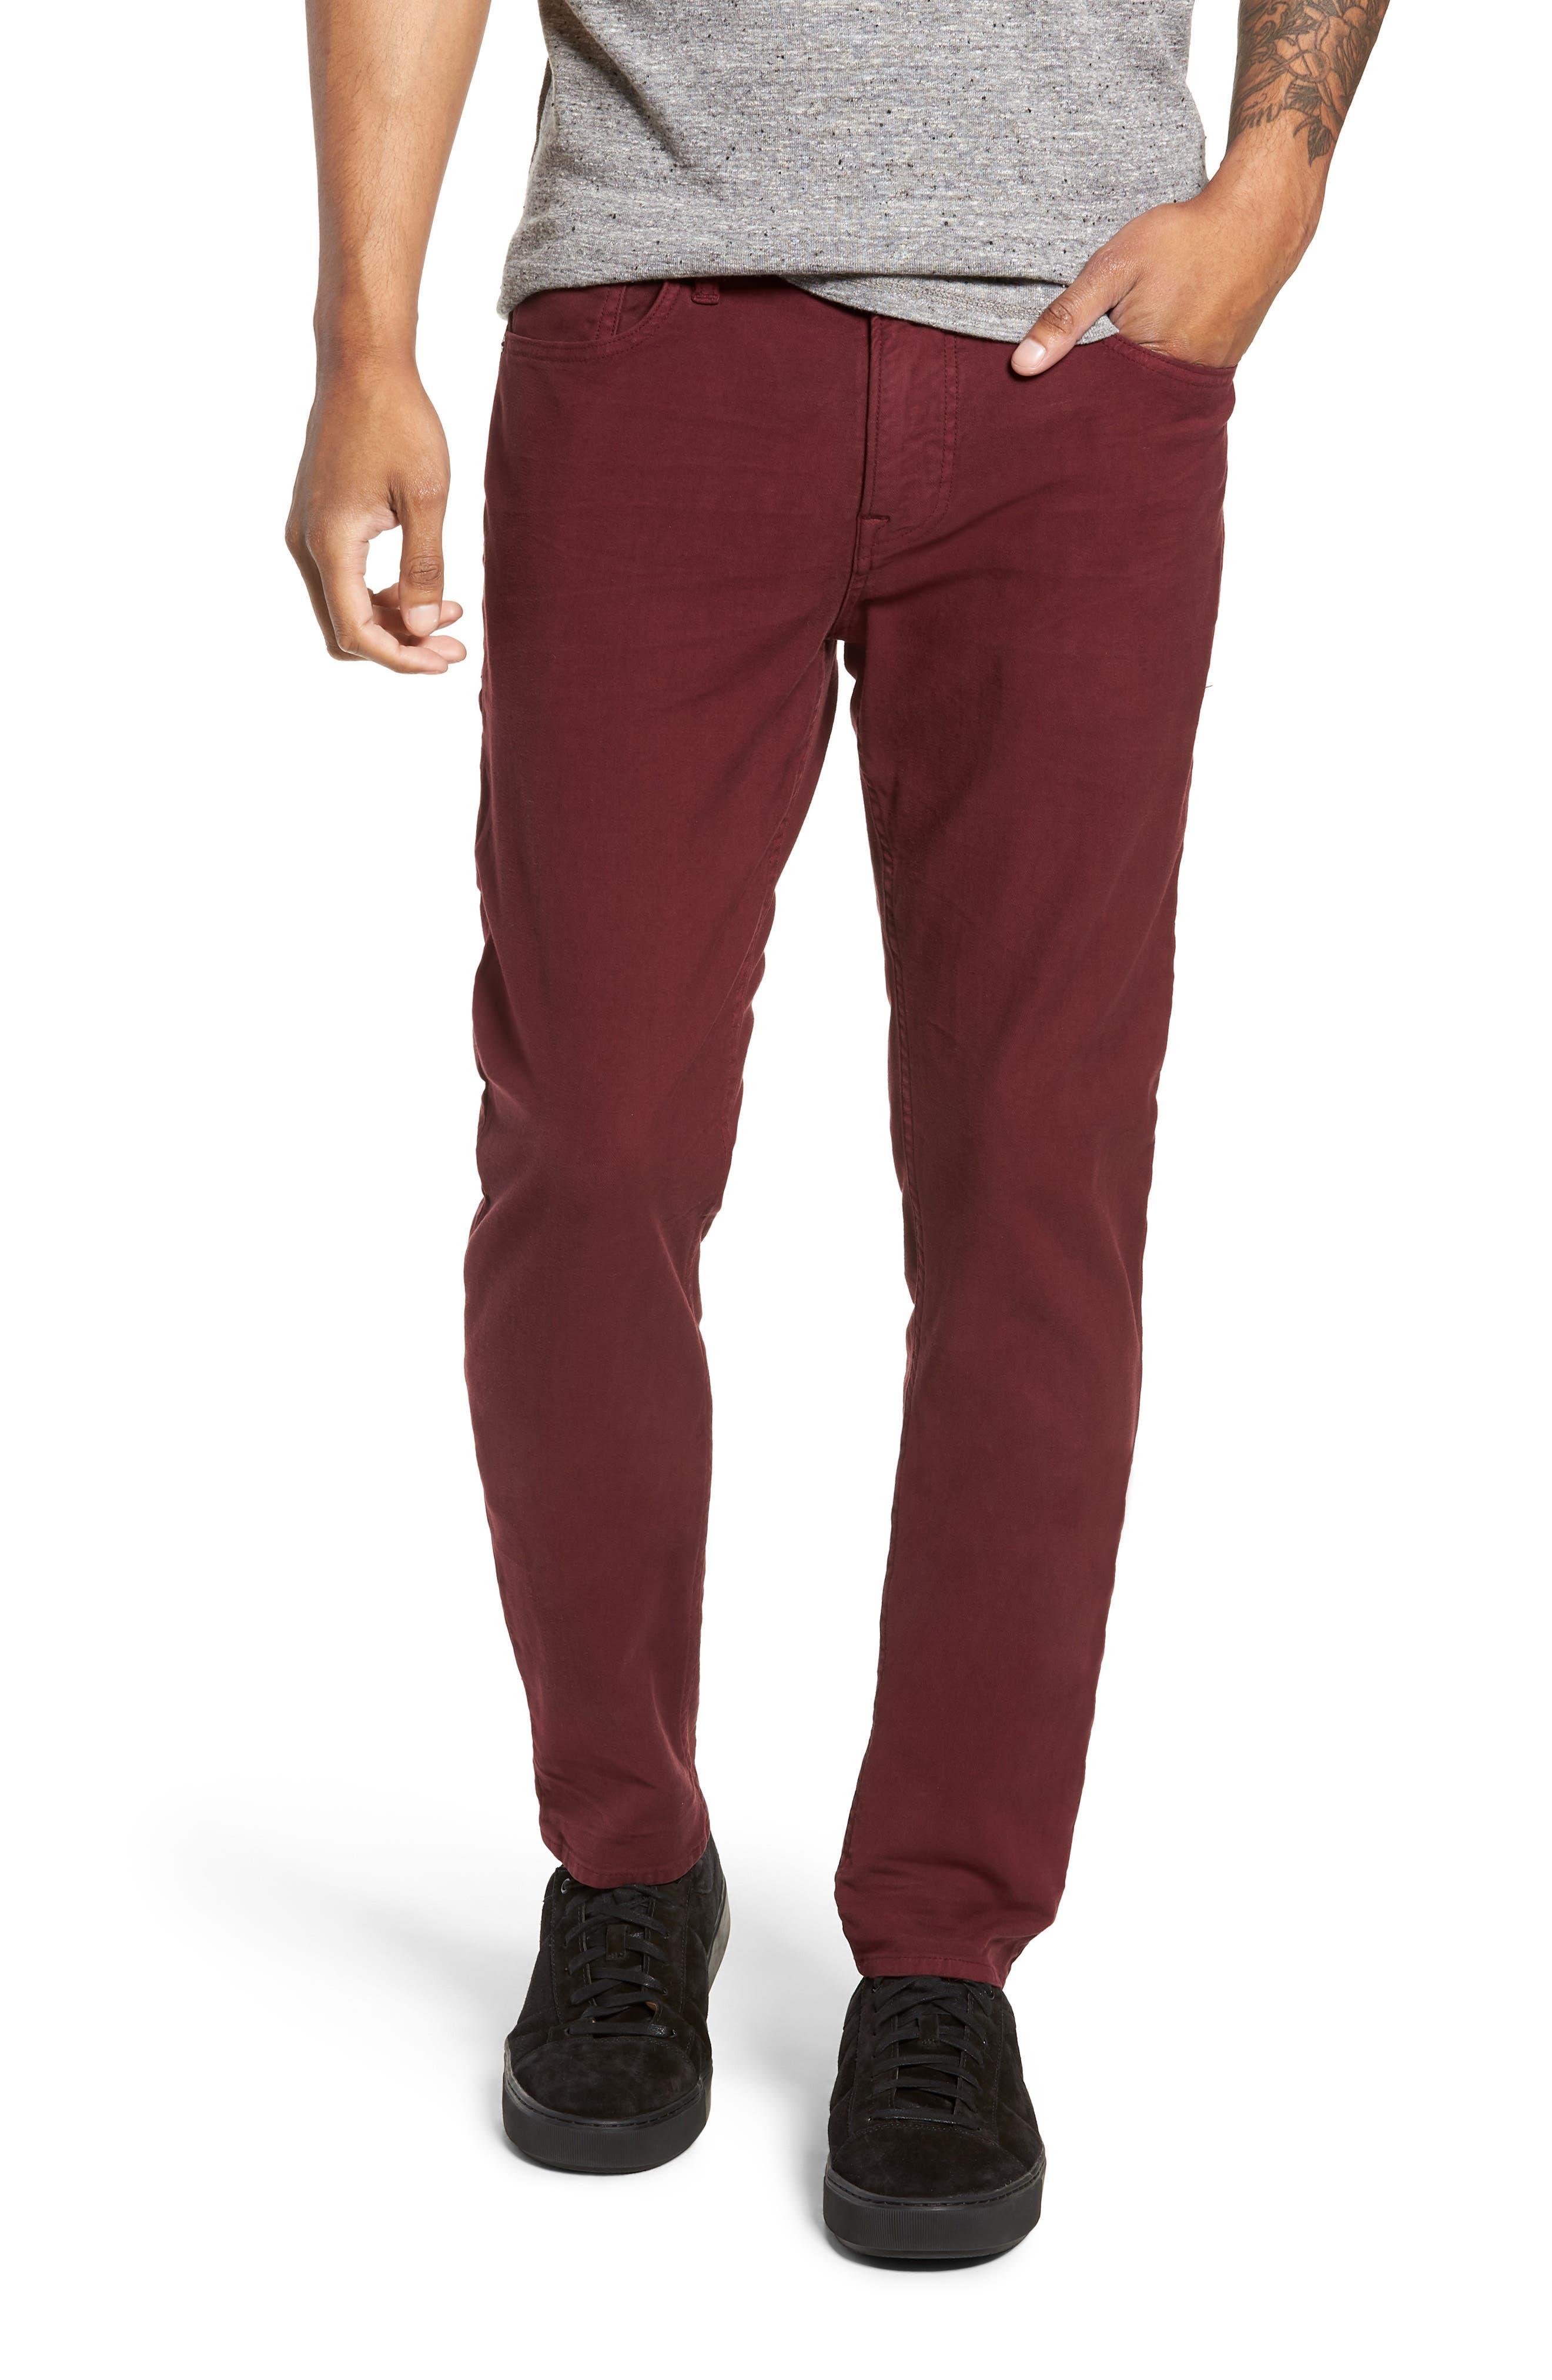 Men's Hudson Jeans Axl Skinny Fit Twill Jeans, Size 29 - Burgundy